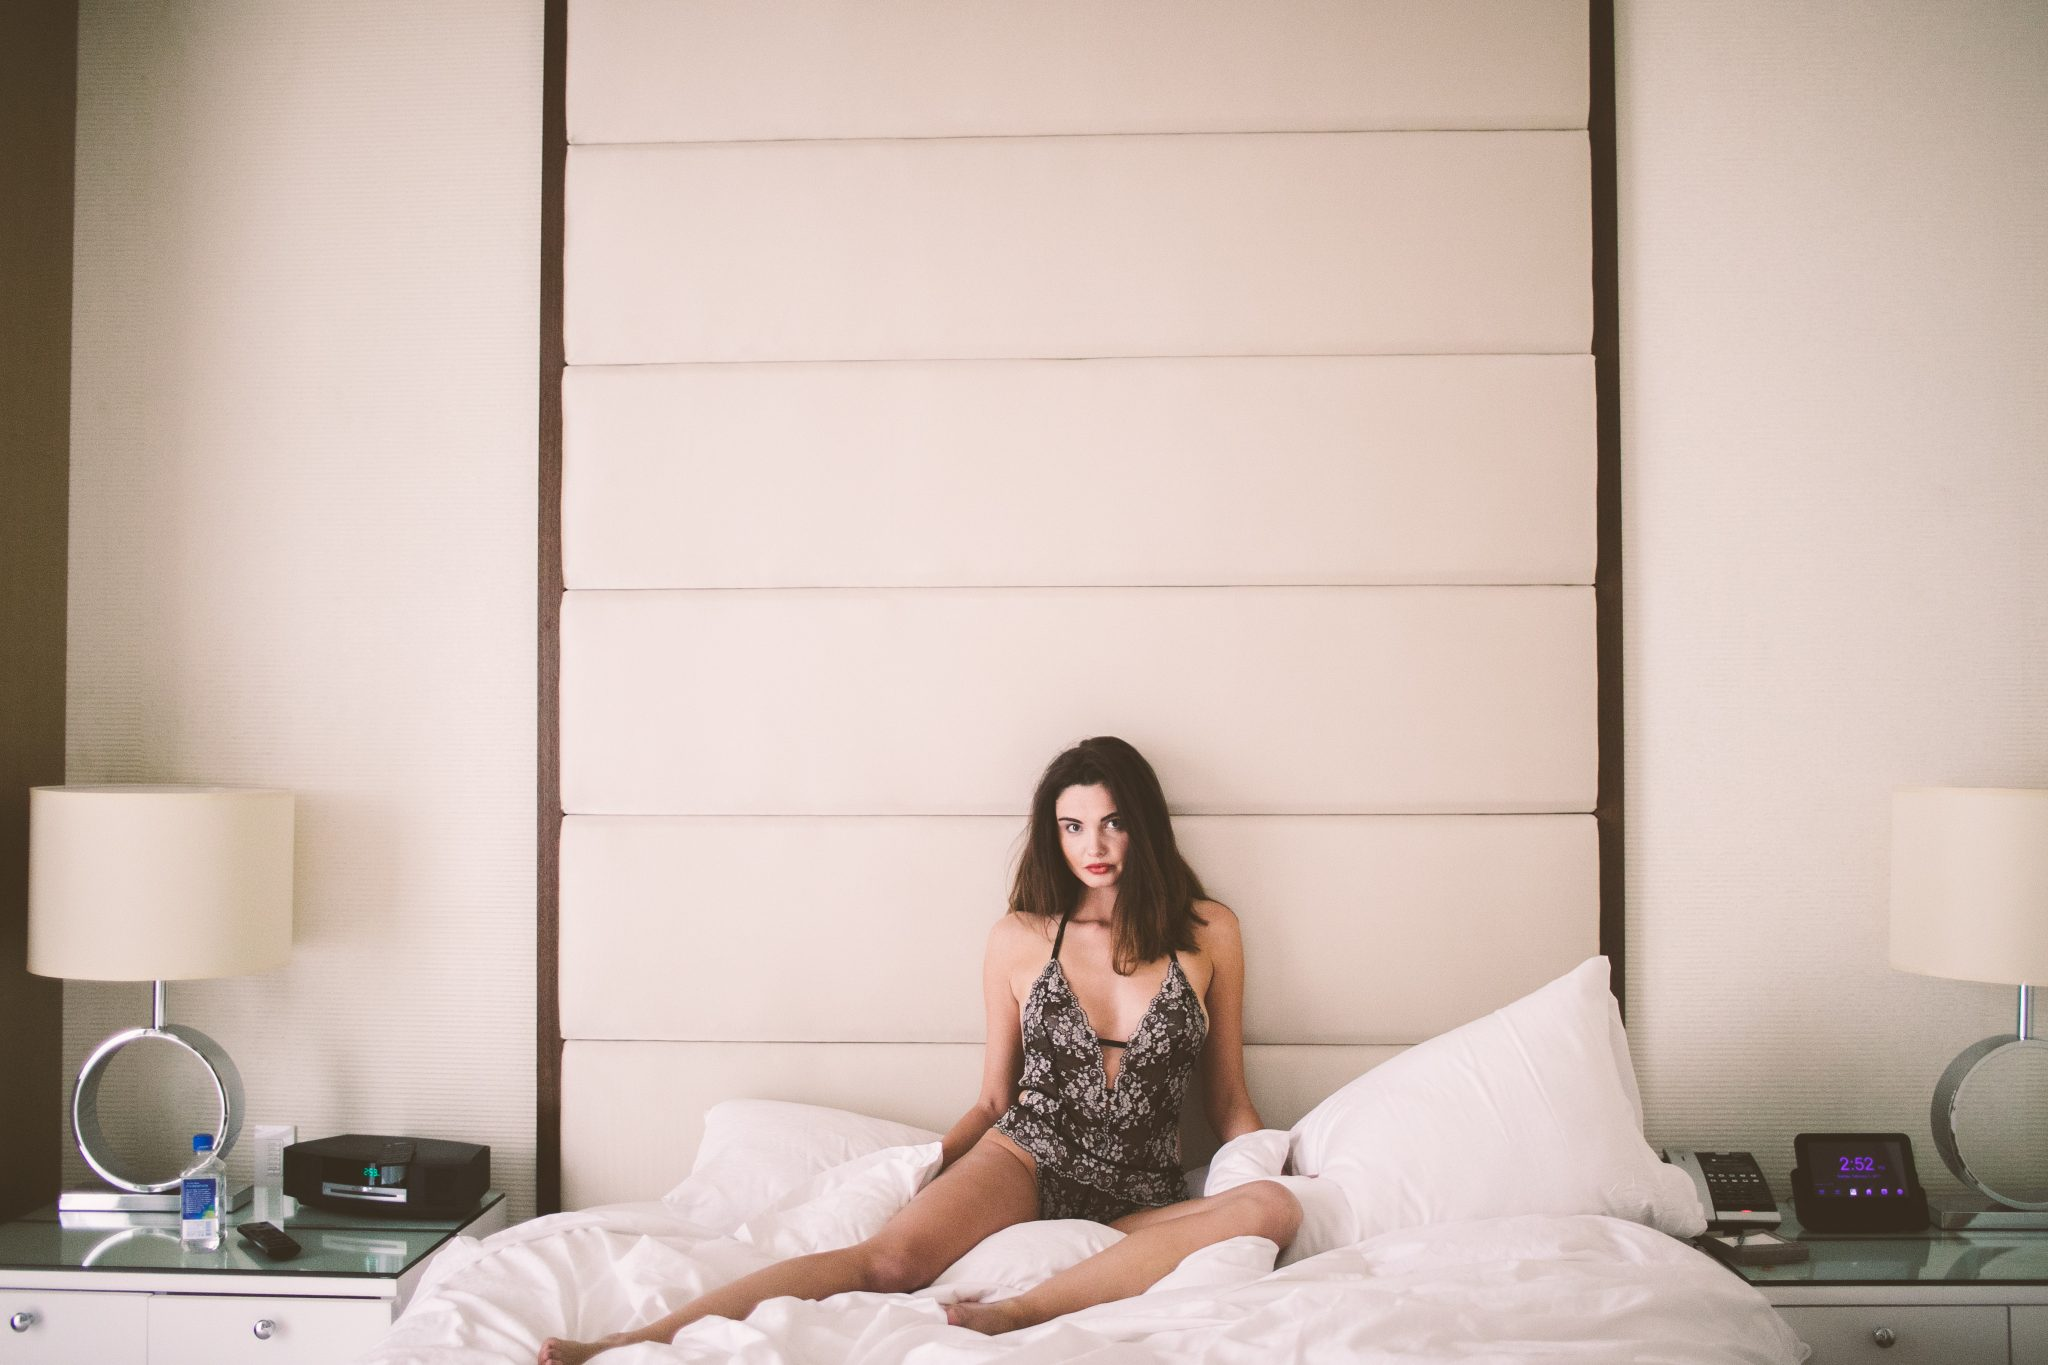 A woman wearing pretty lingerie